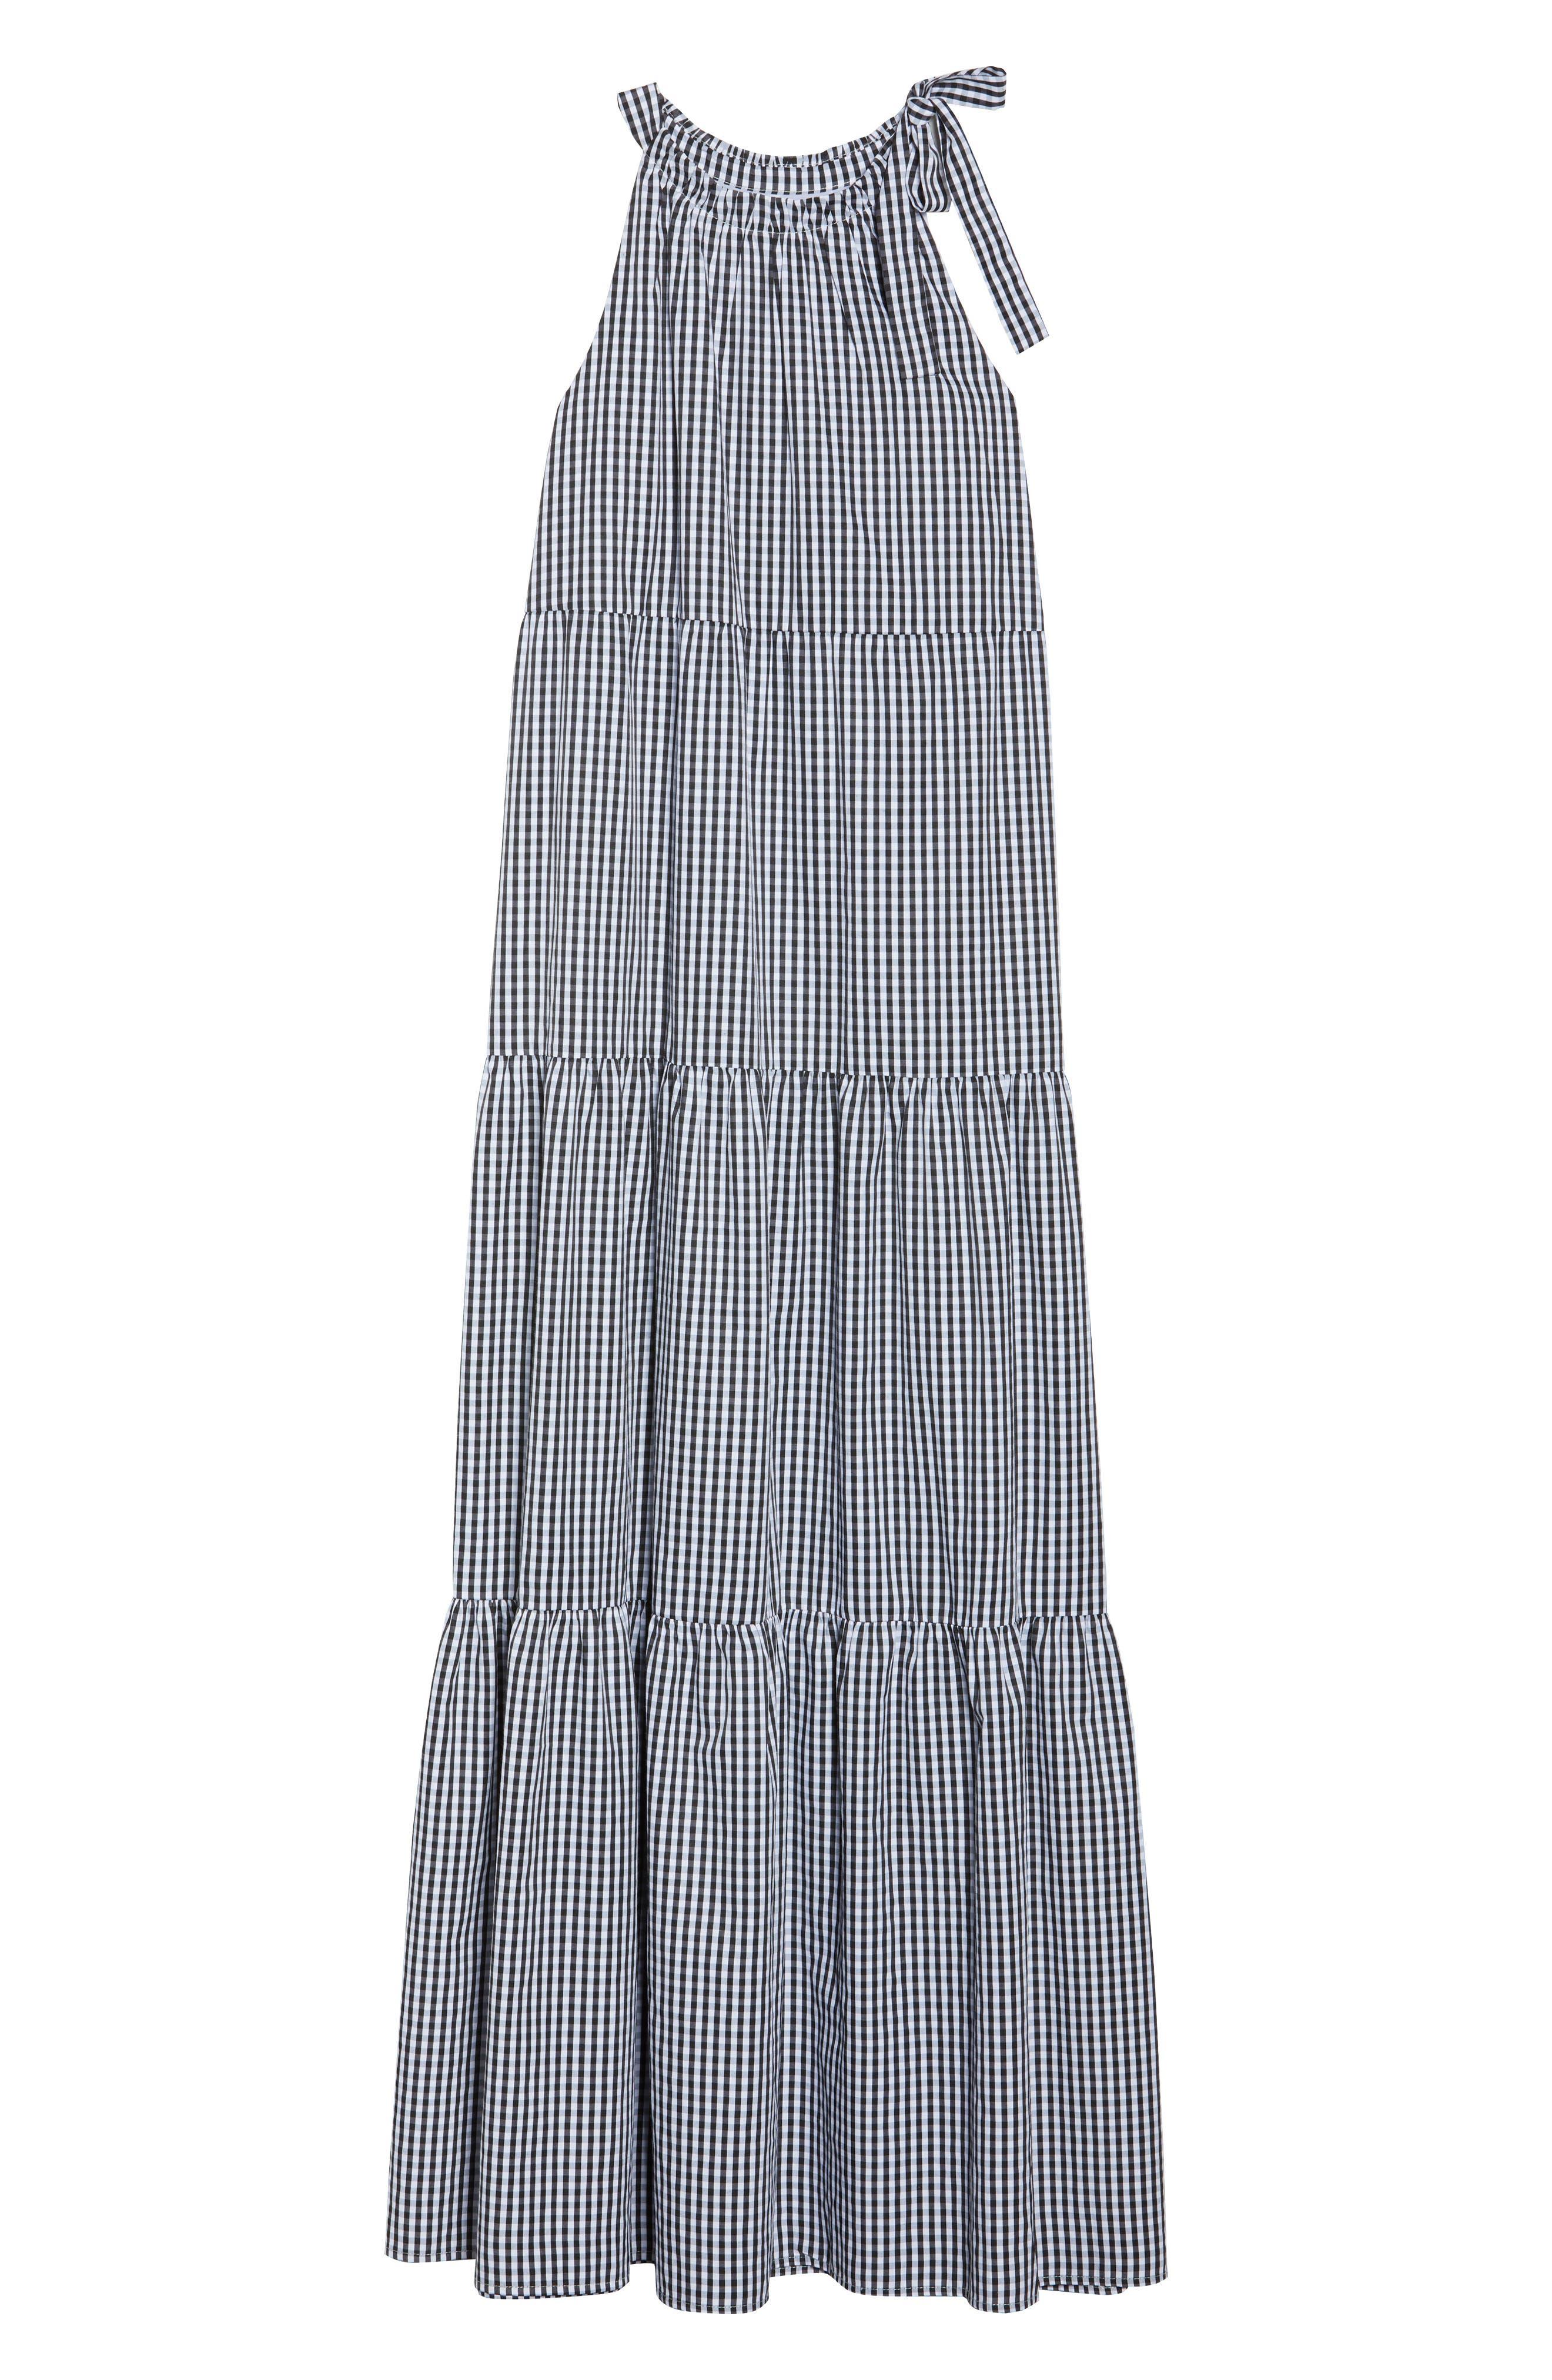 Gingham Check Maxi Dress,                             Alternate thumbnail 7, color,                             100